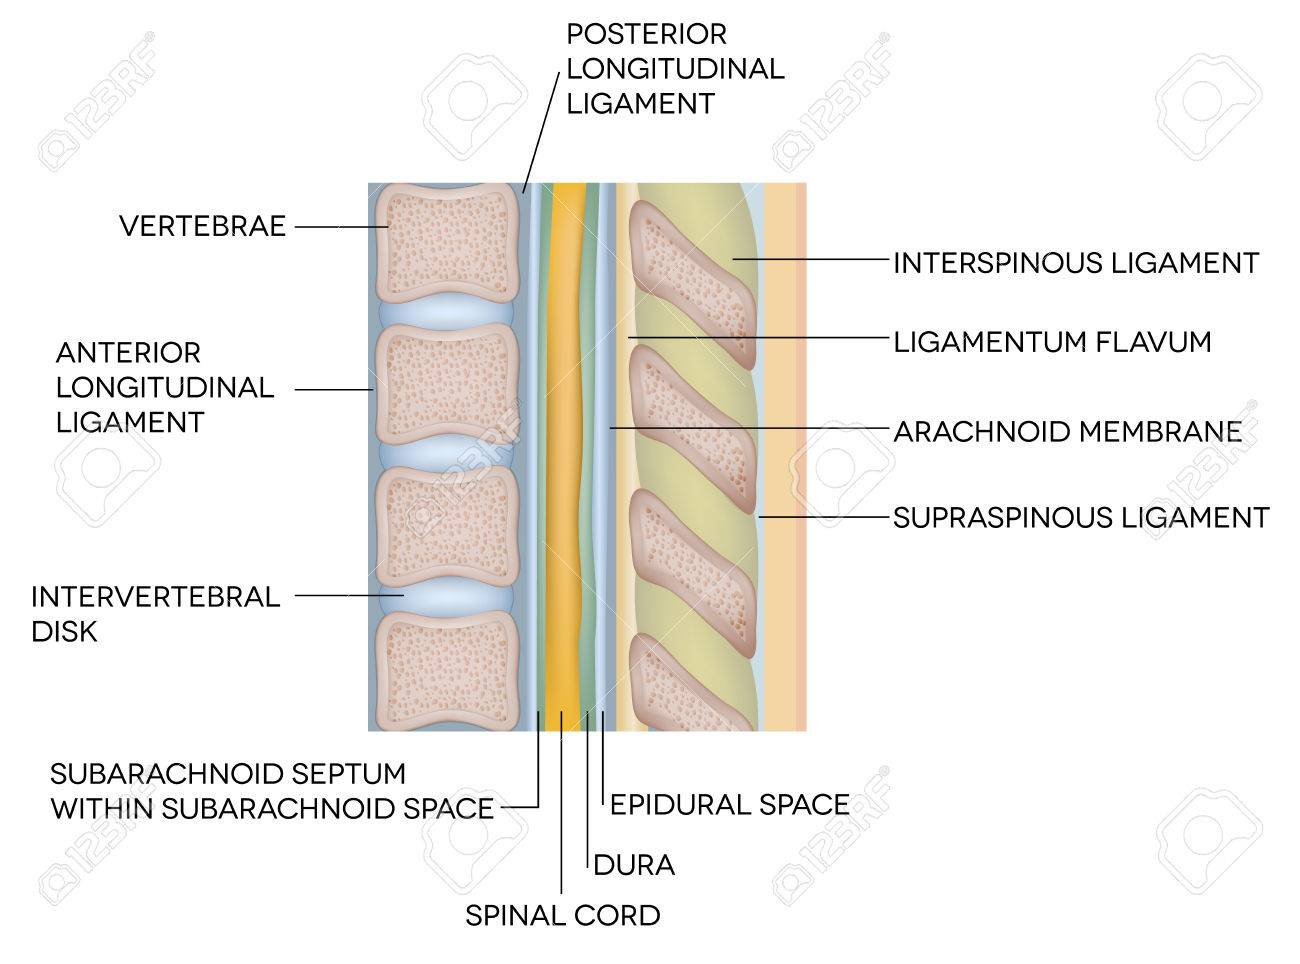 Human Spine Vertebral Bones And Inter Vertebral Disks Royalty Free